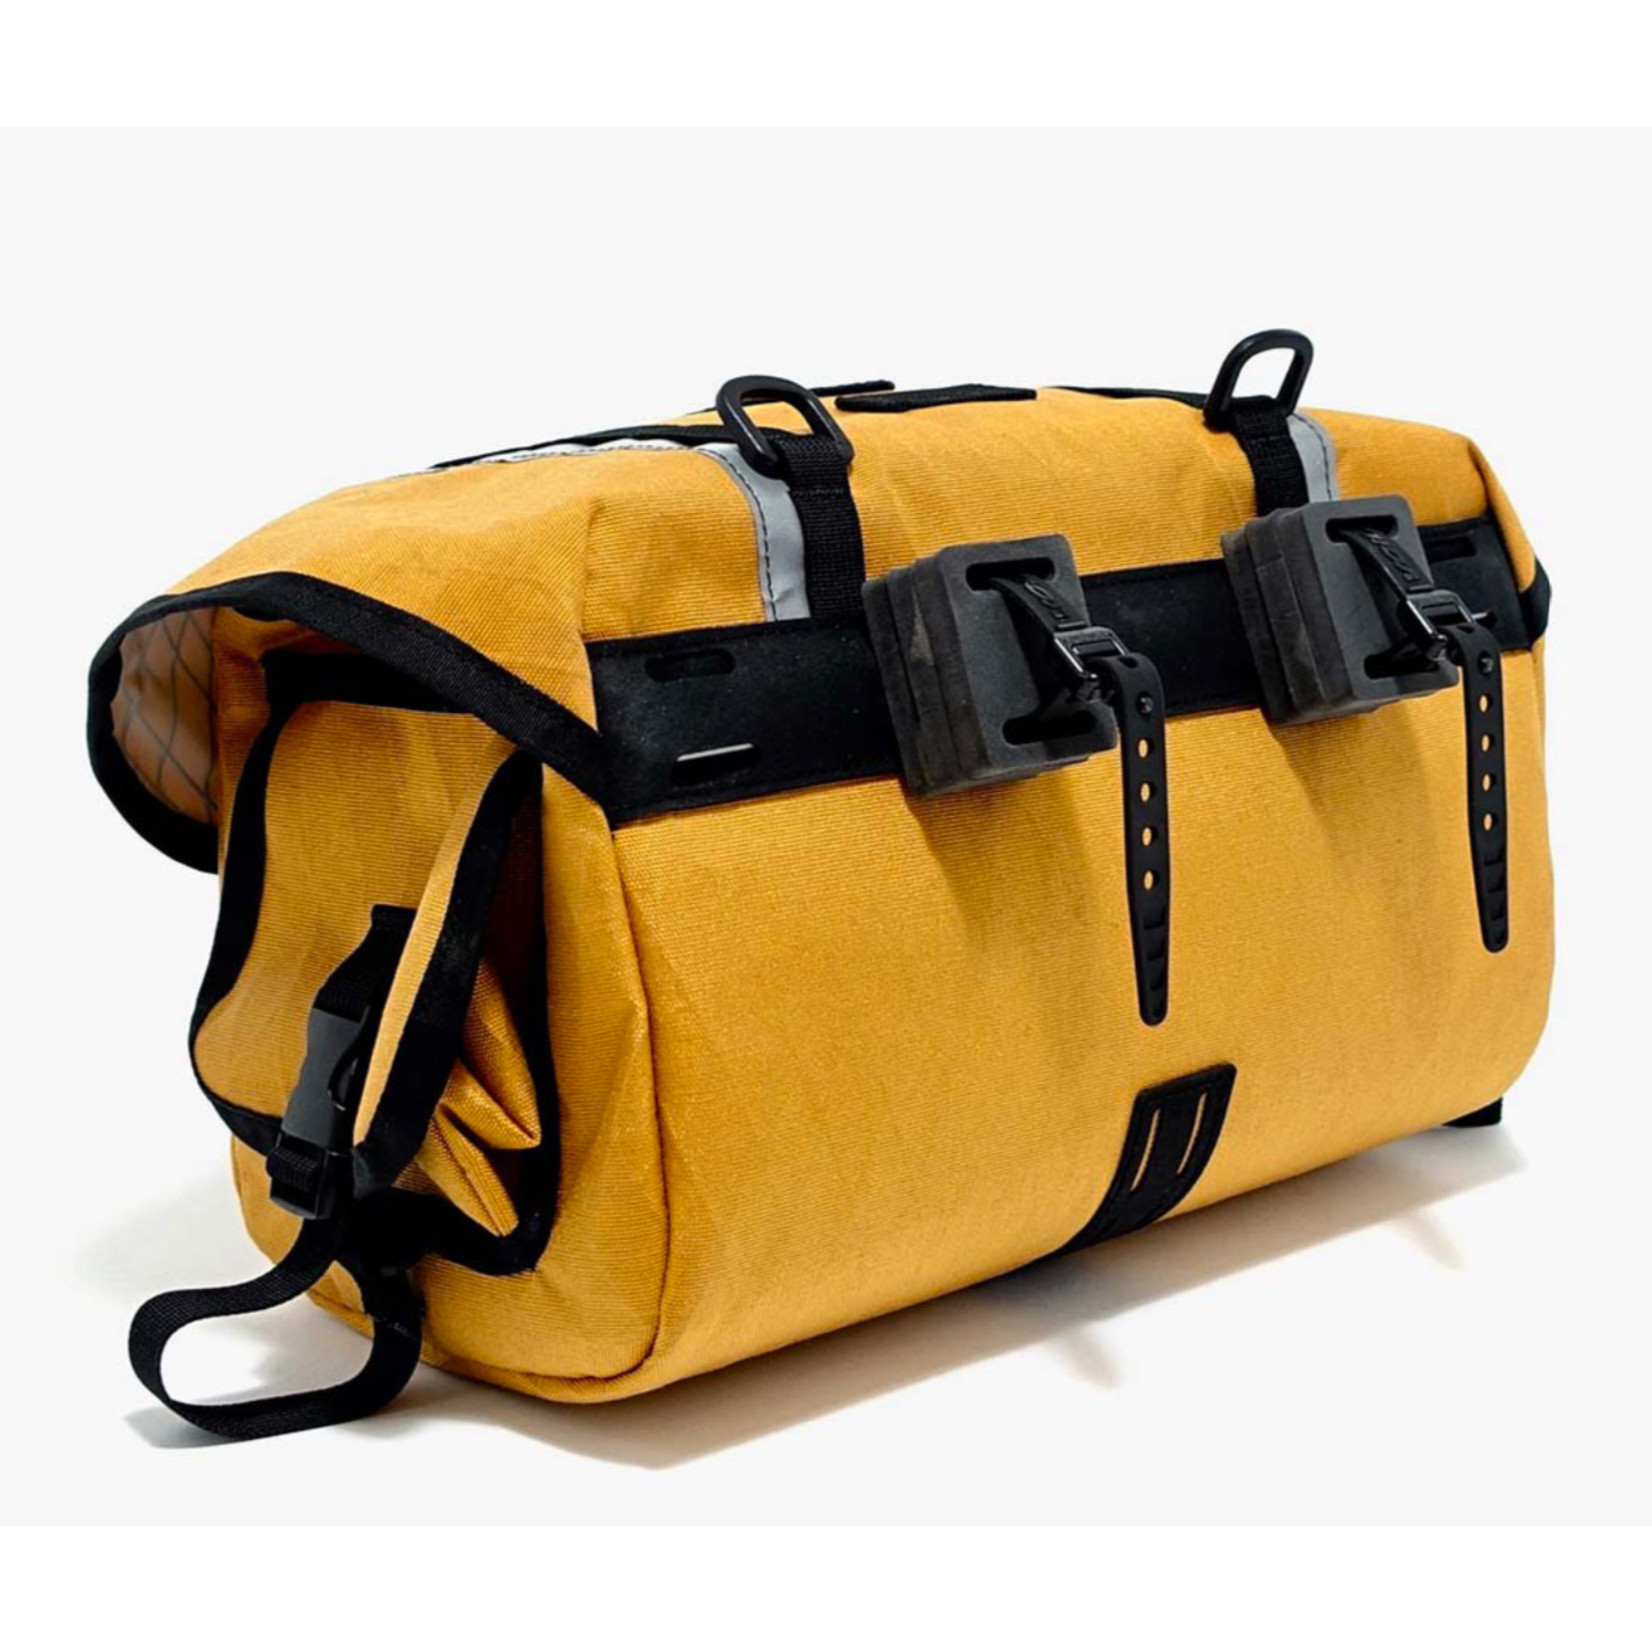 Swift Industries Swift Industries Handlebar Bag Foam Spacer Kit